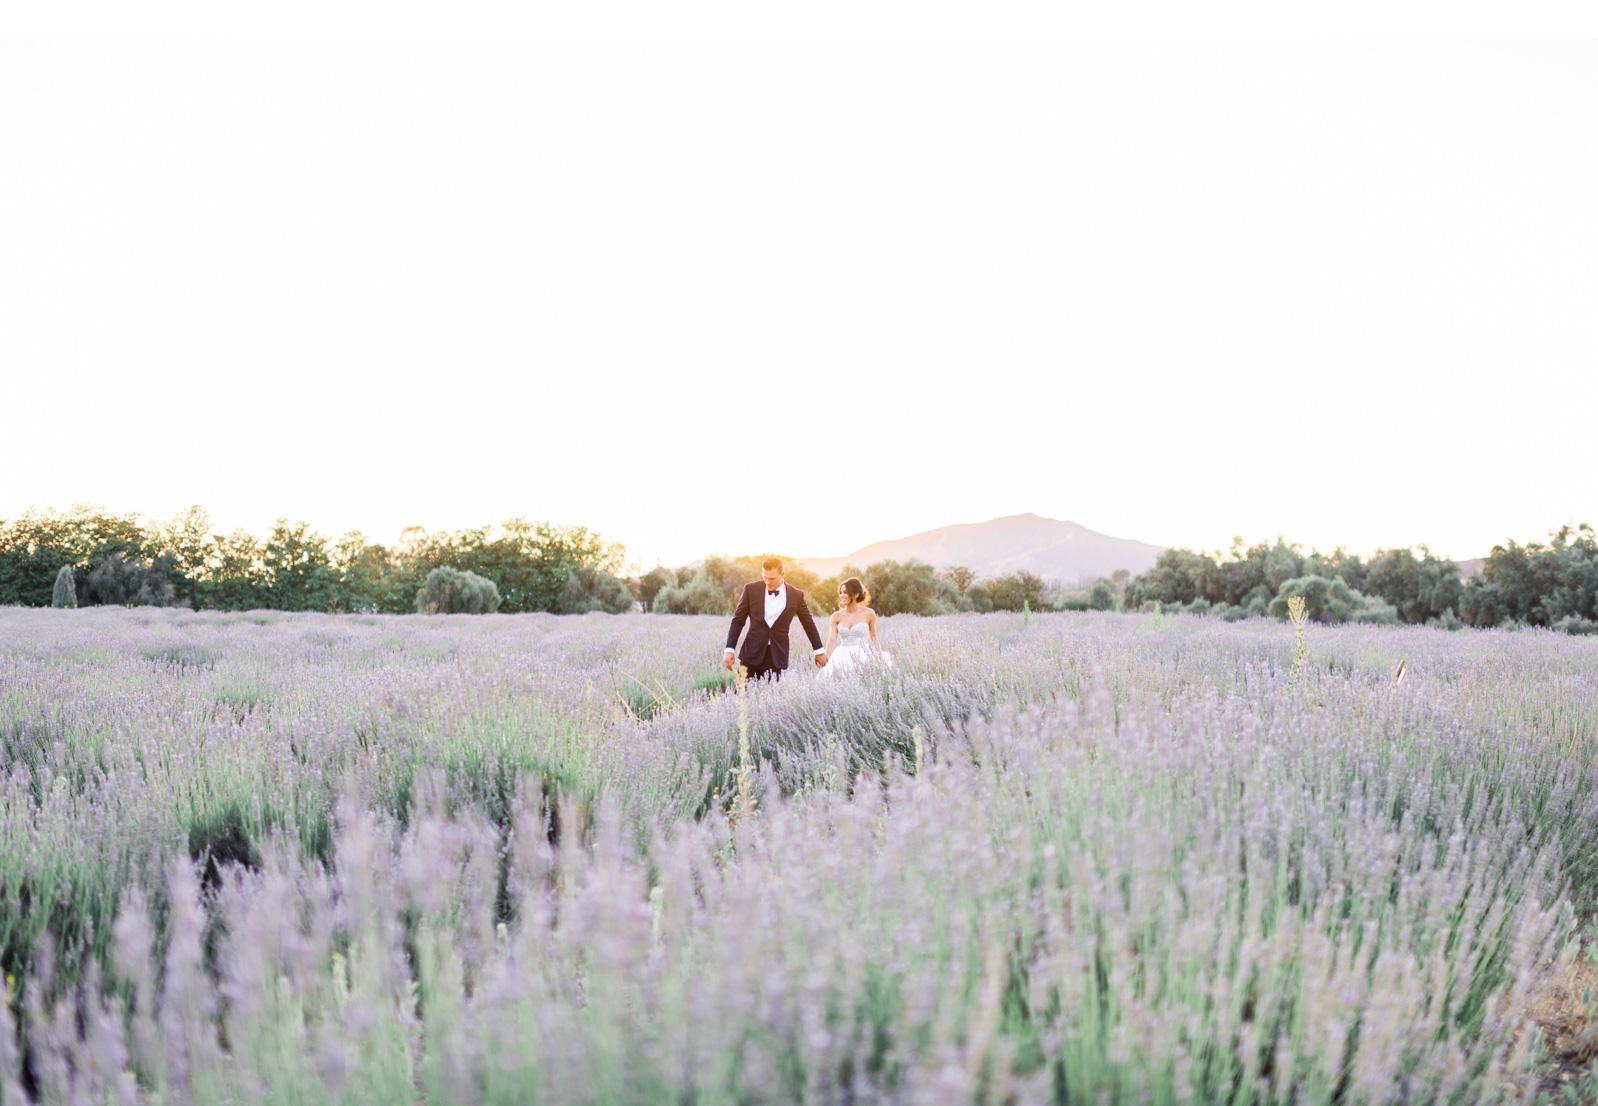 California-Lavender-Field-Wedding-Natalie-Schutt-Photography-Style-Me-Pretty_11.jpg